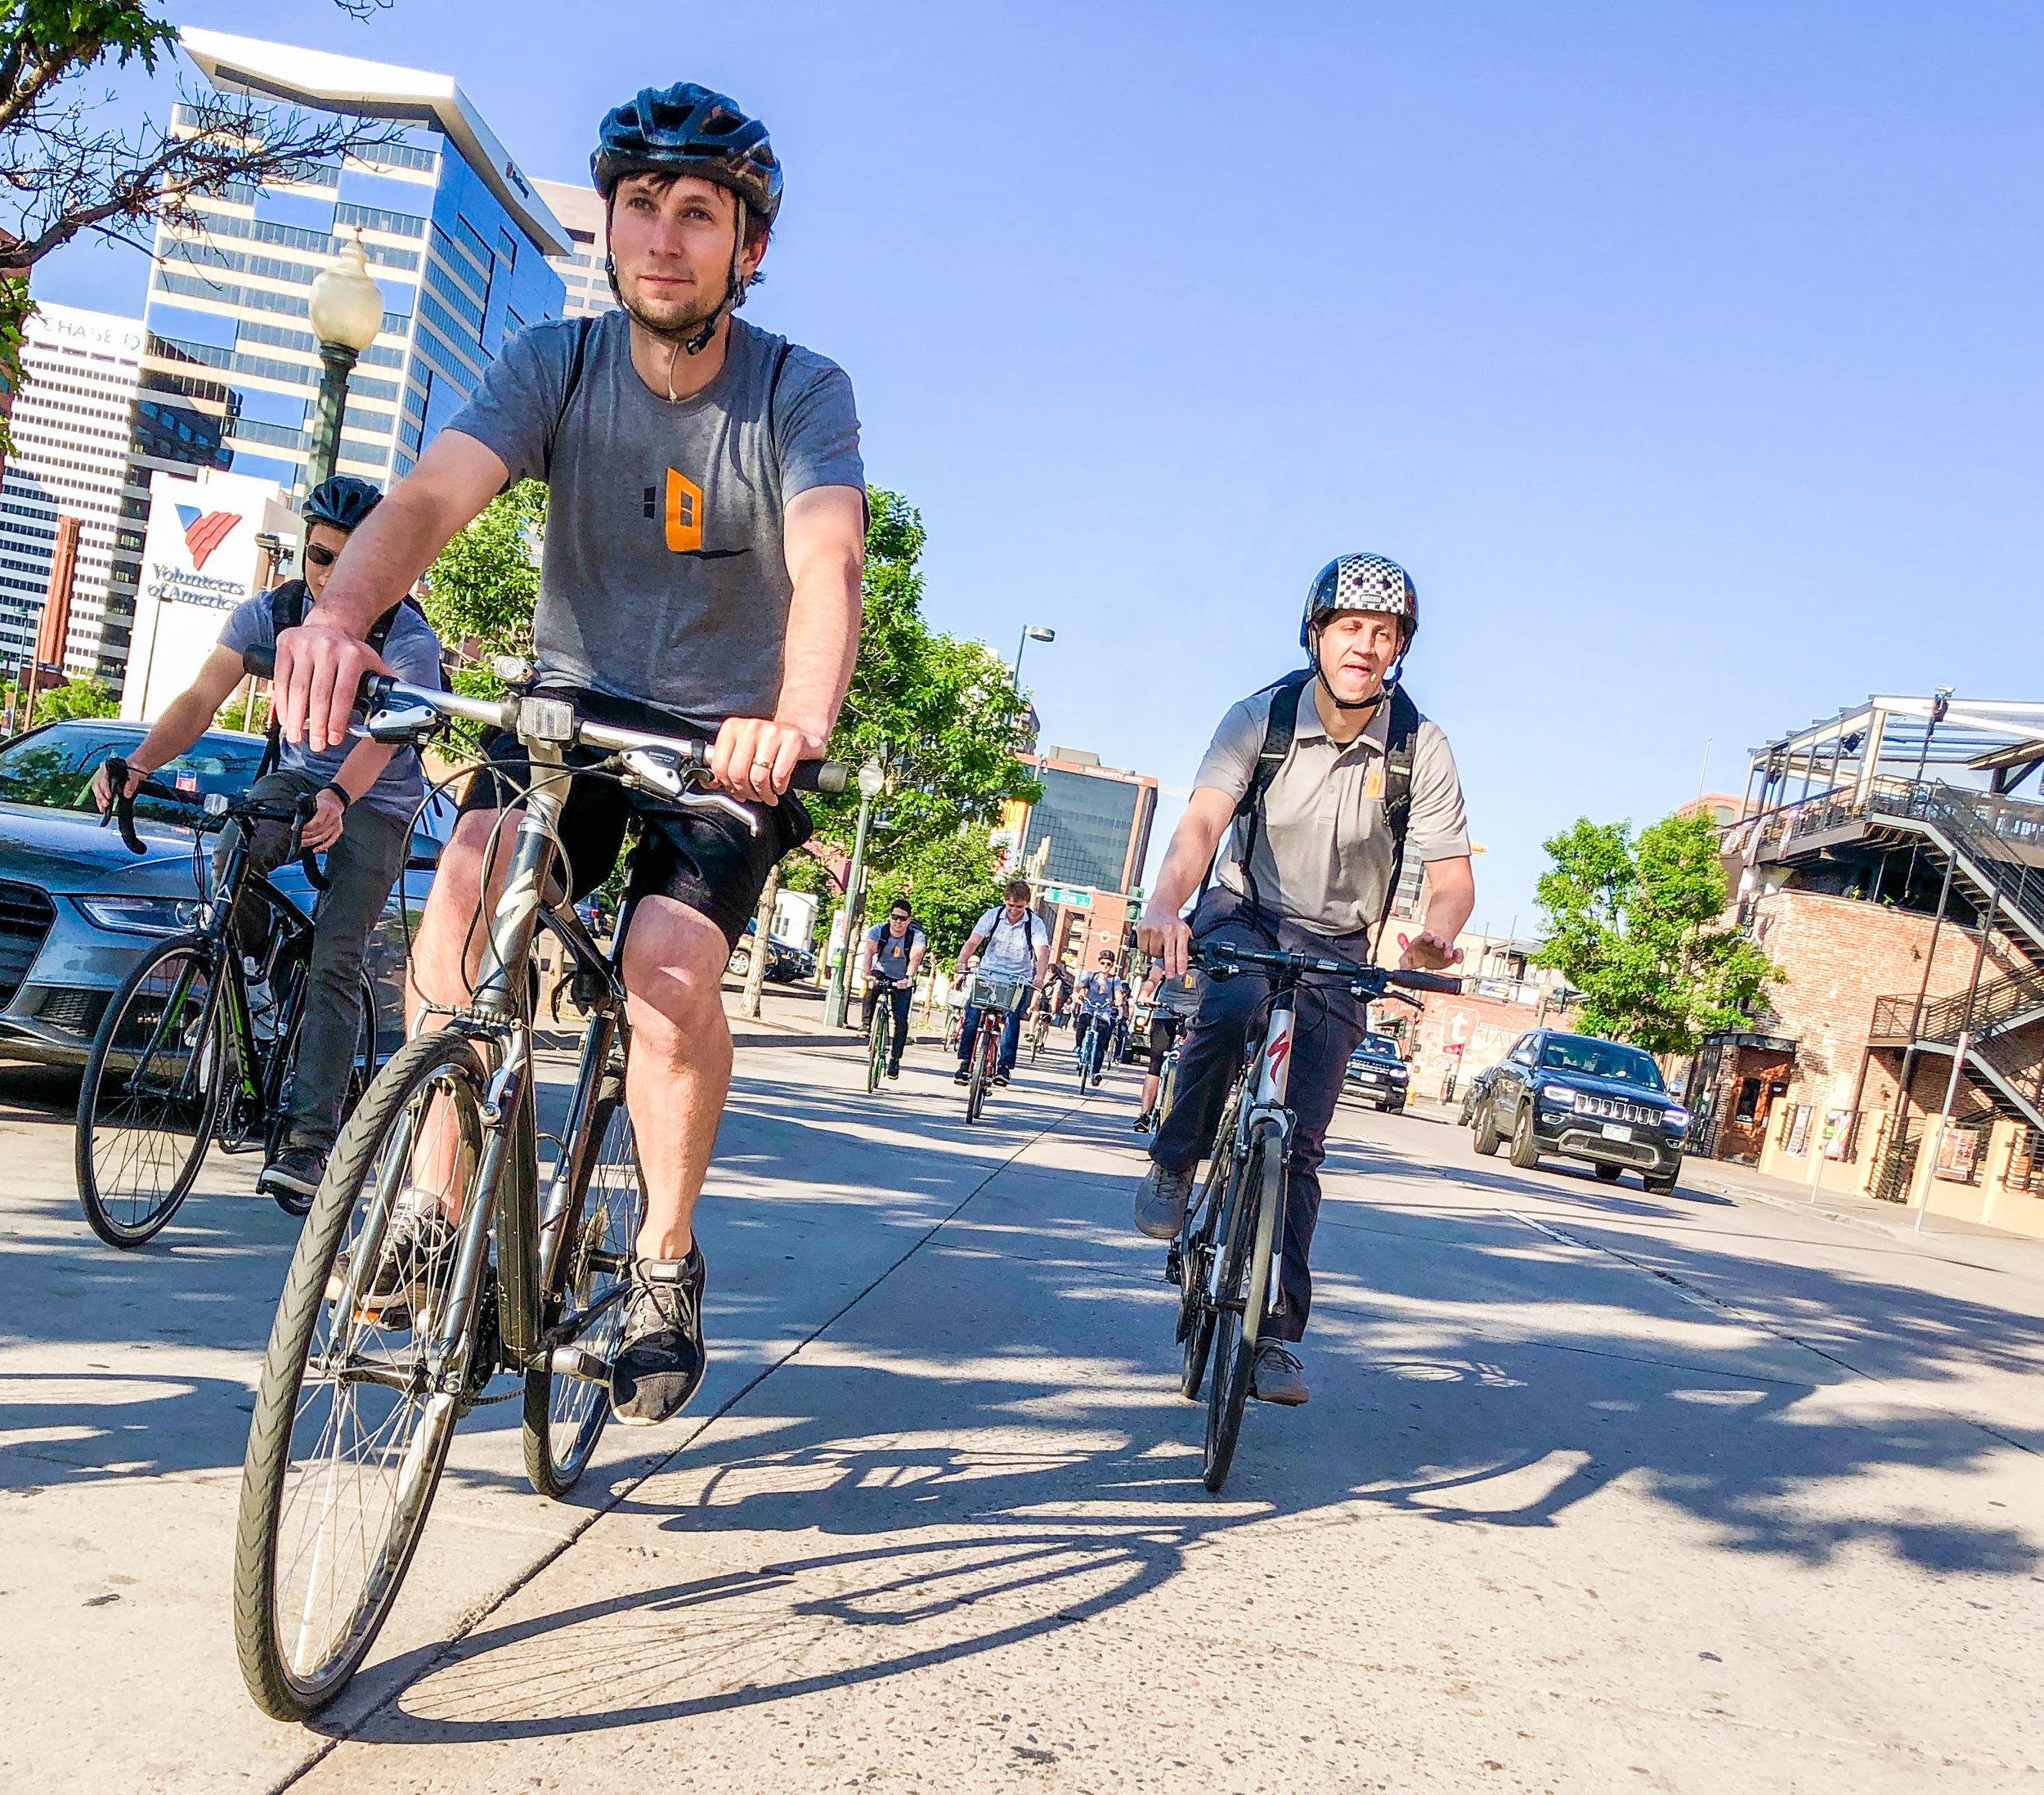 2018 06 27 - Bike to Work Day (33).jpg